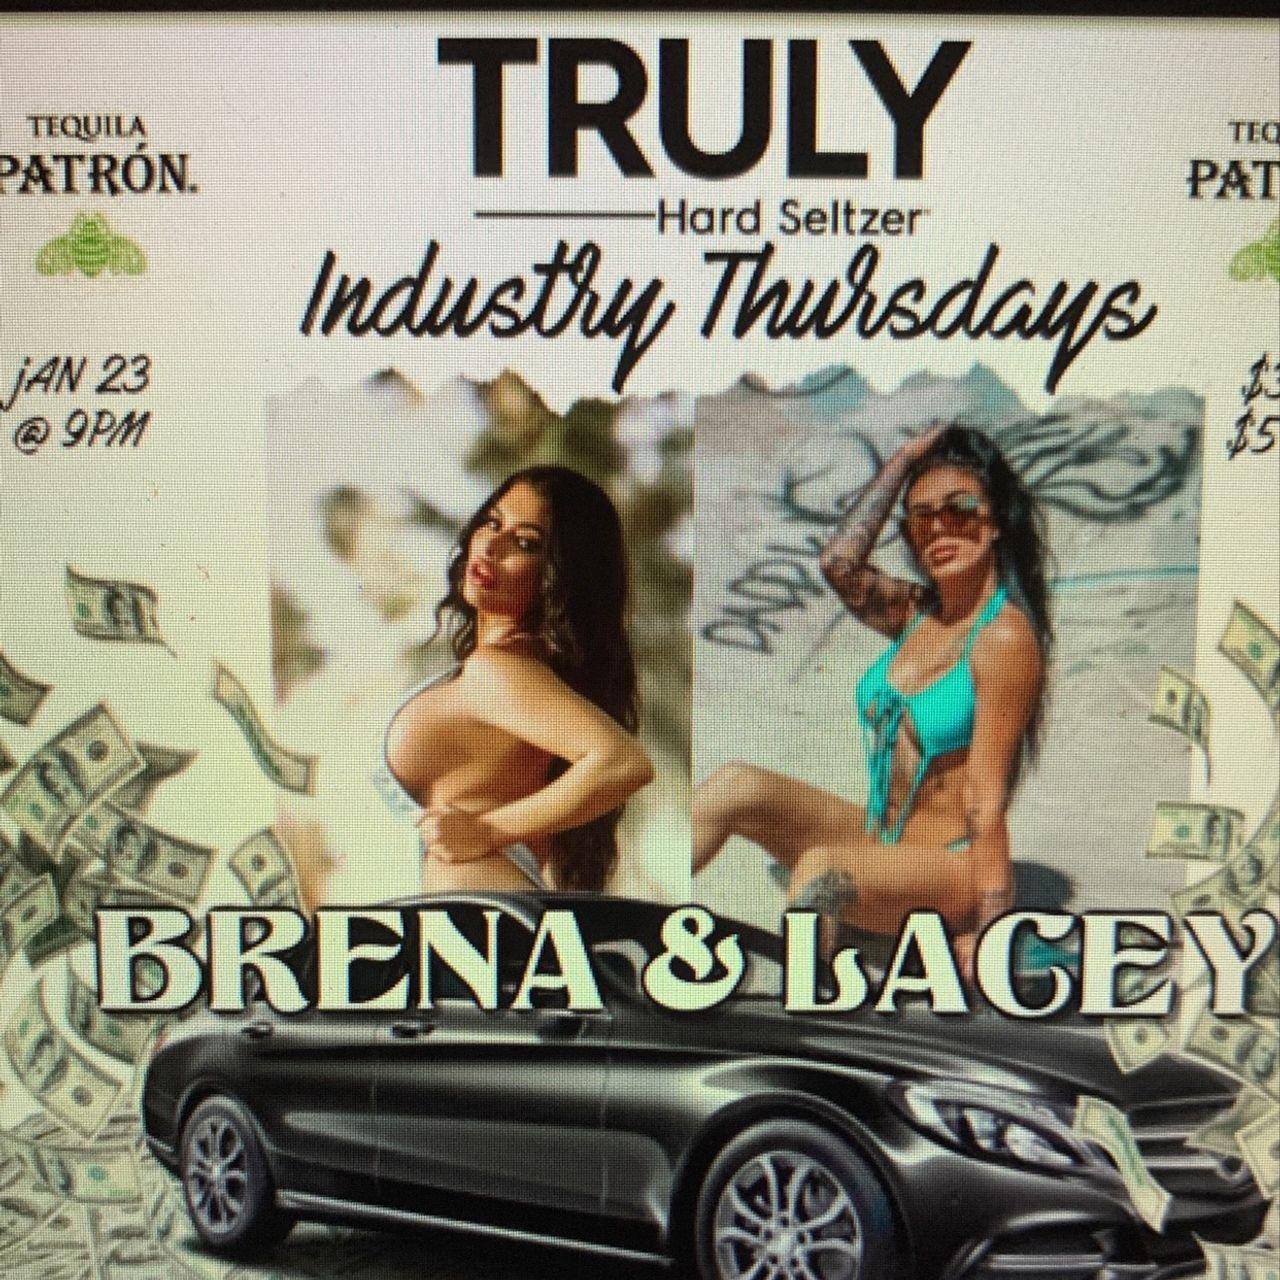 Industry Thursday's!!!